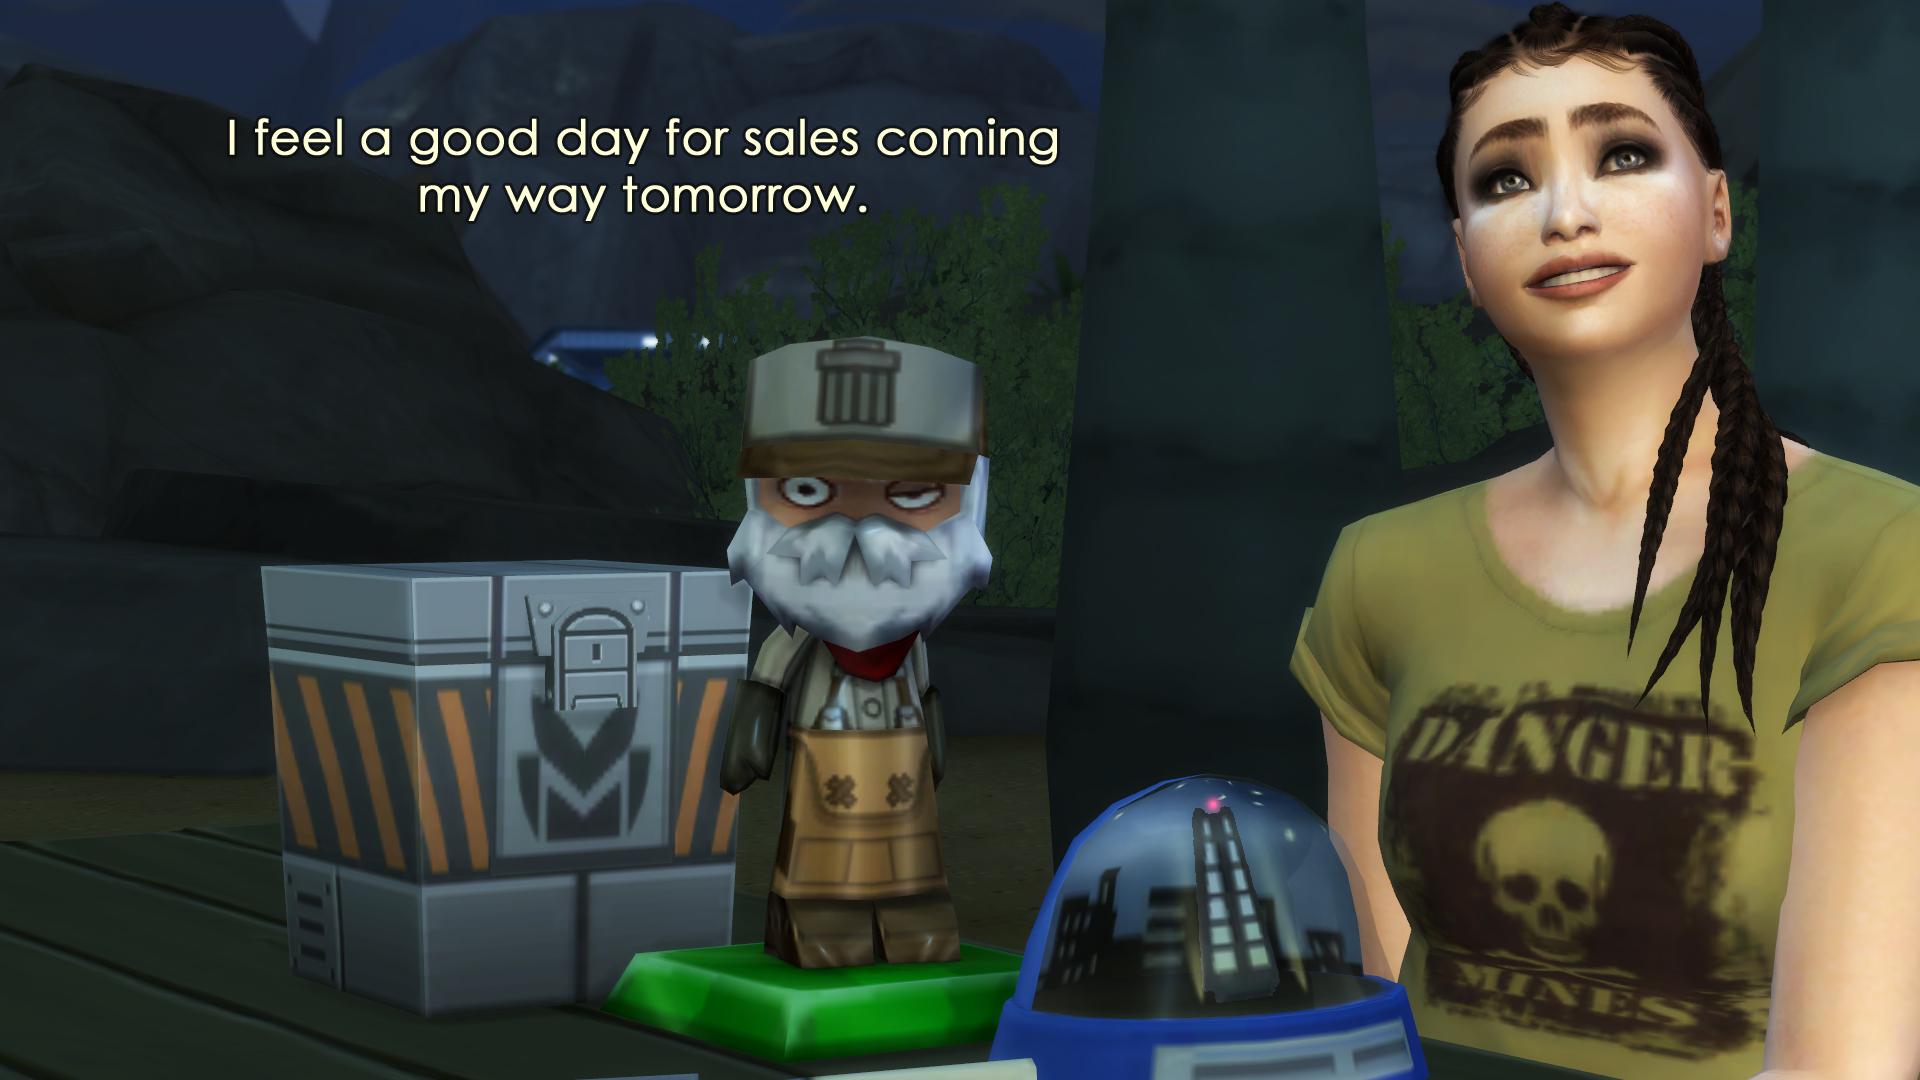 10 sales tomorrow